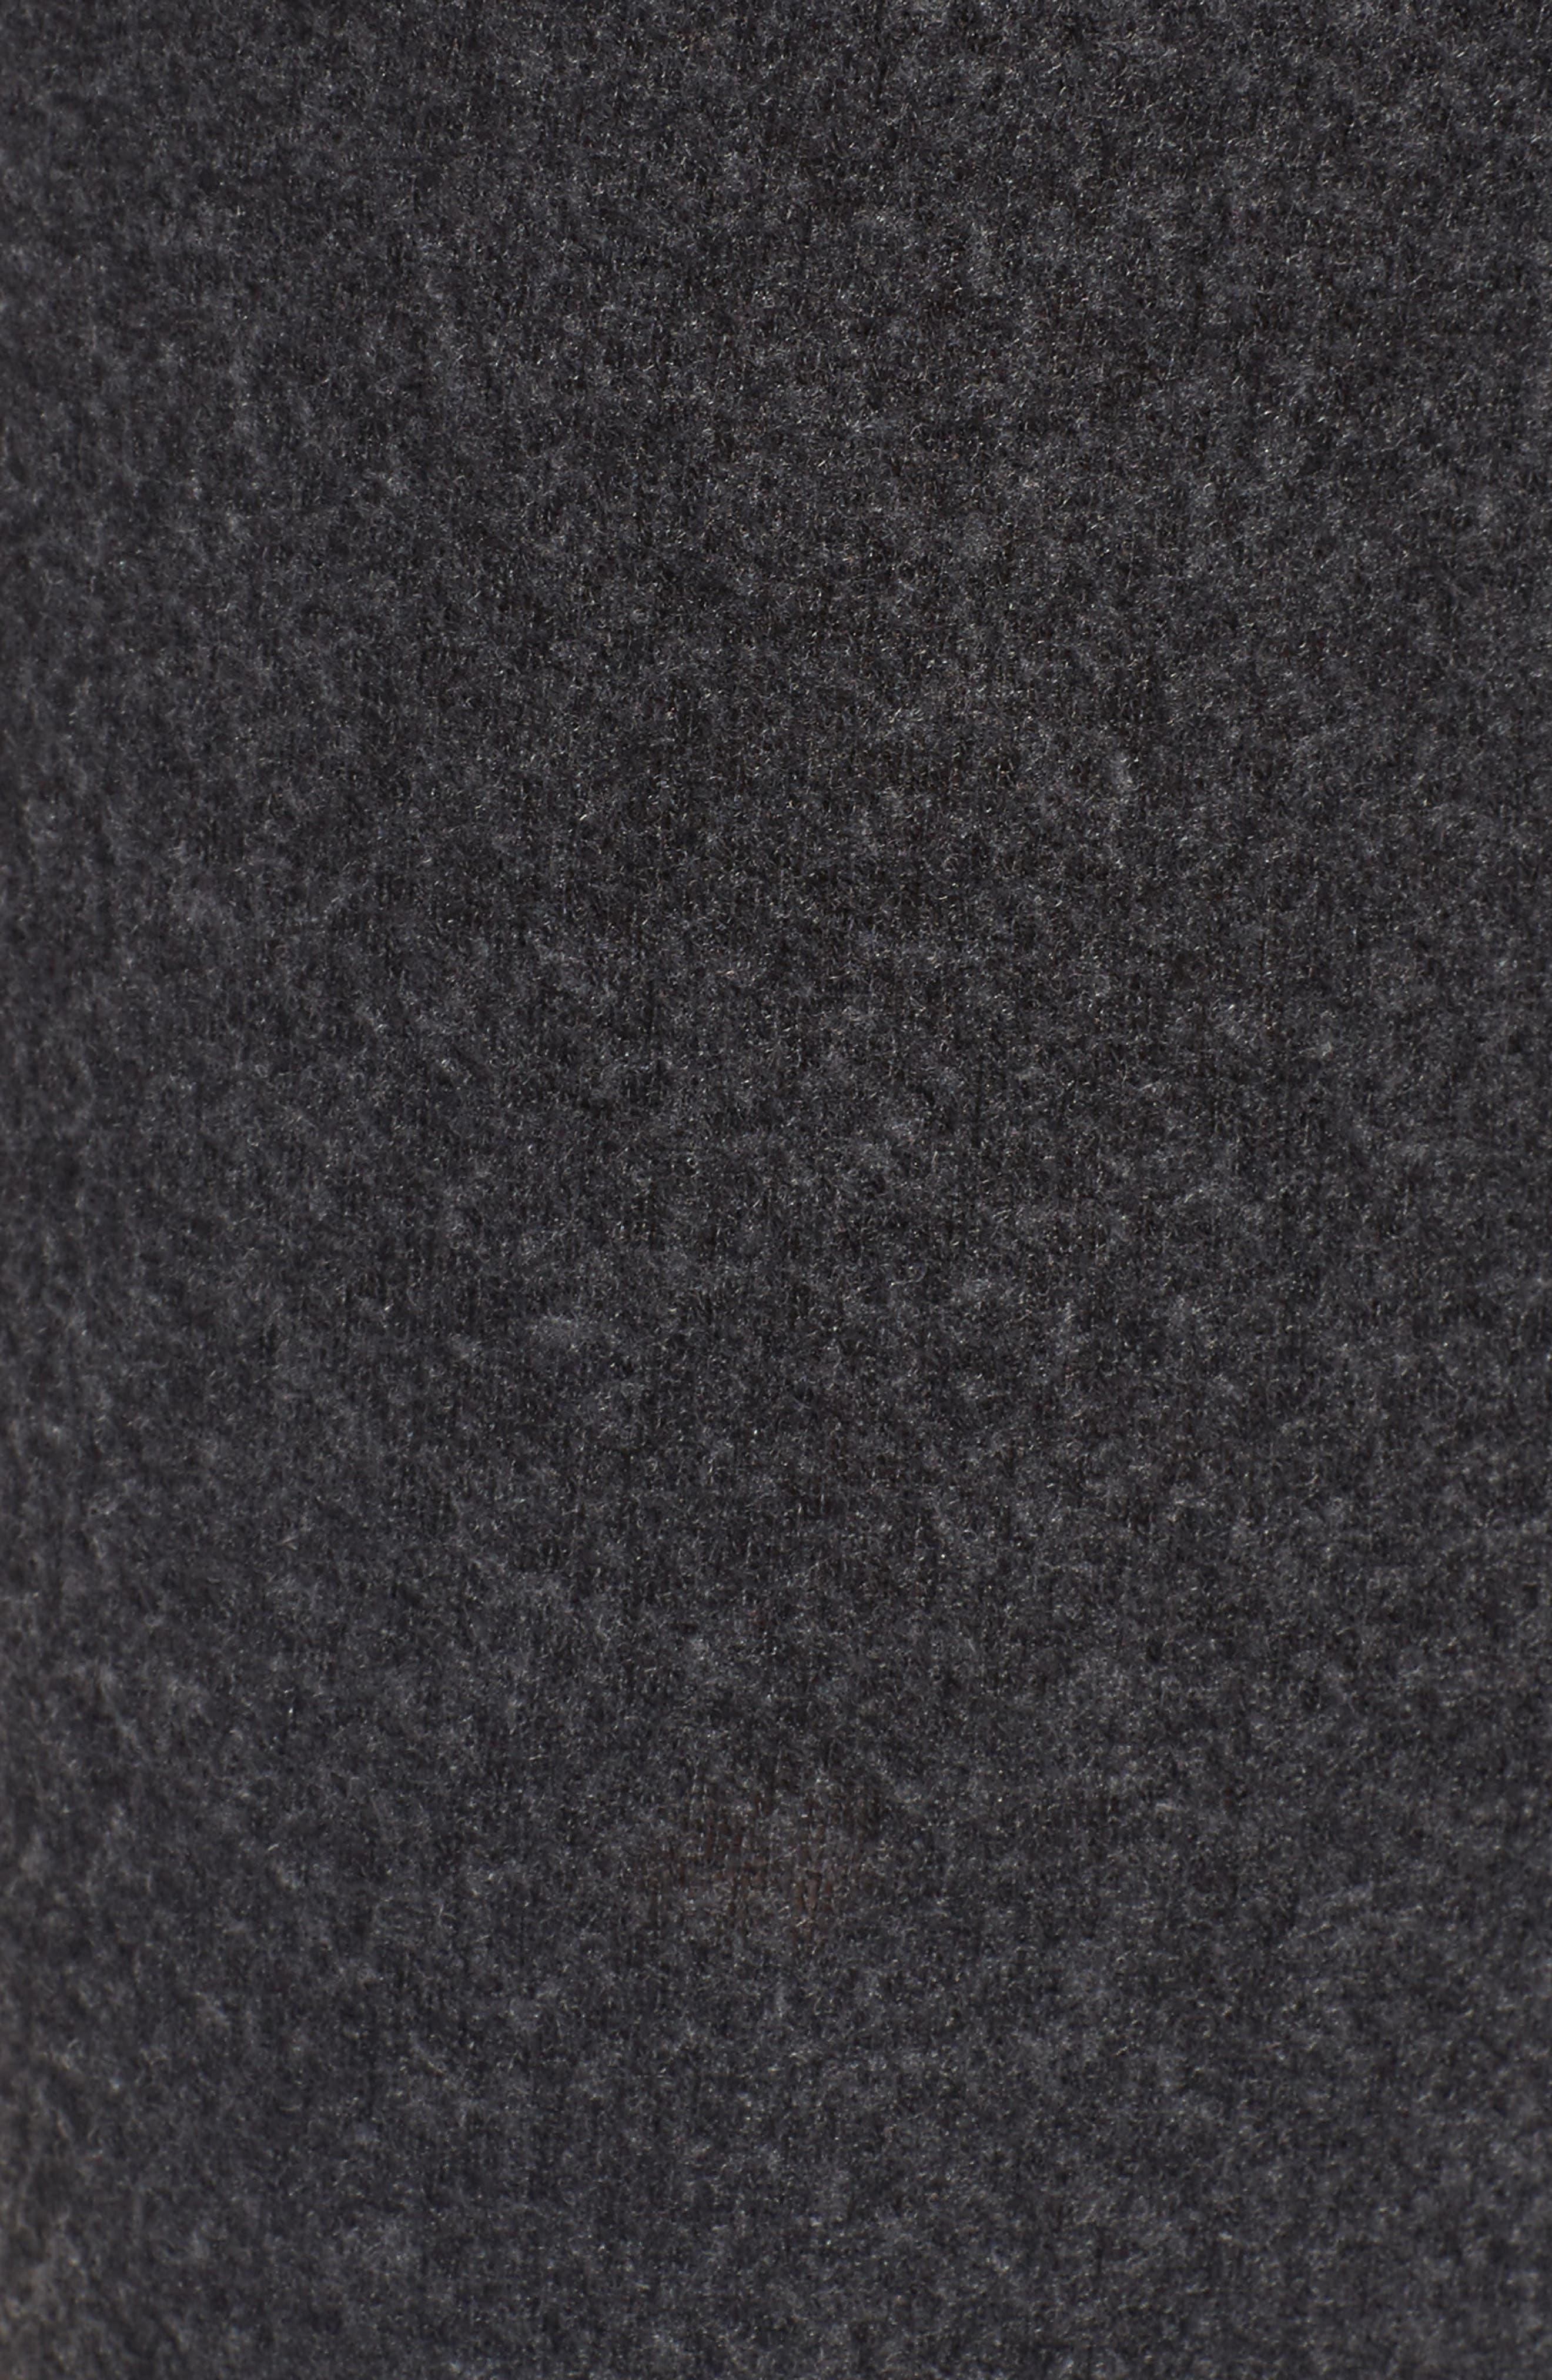 Salty Hair Track Pants,                             Alternate thumbnail 5, color,                             Black